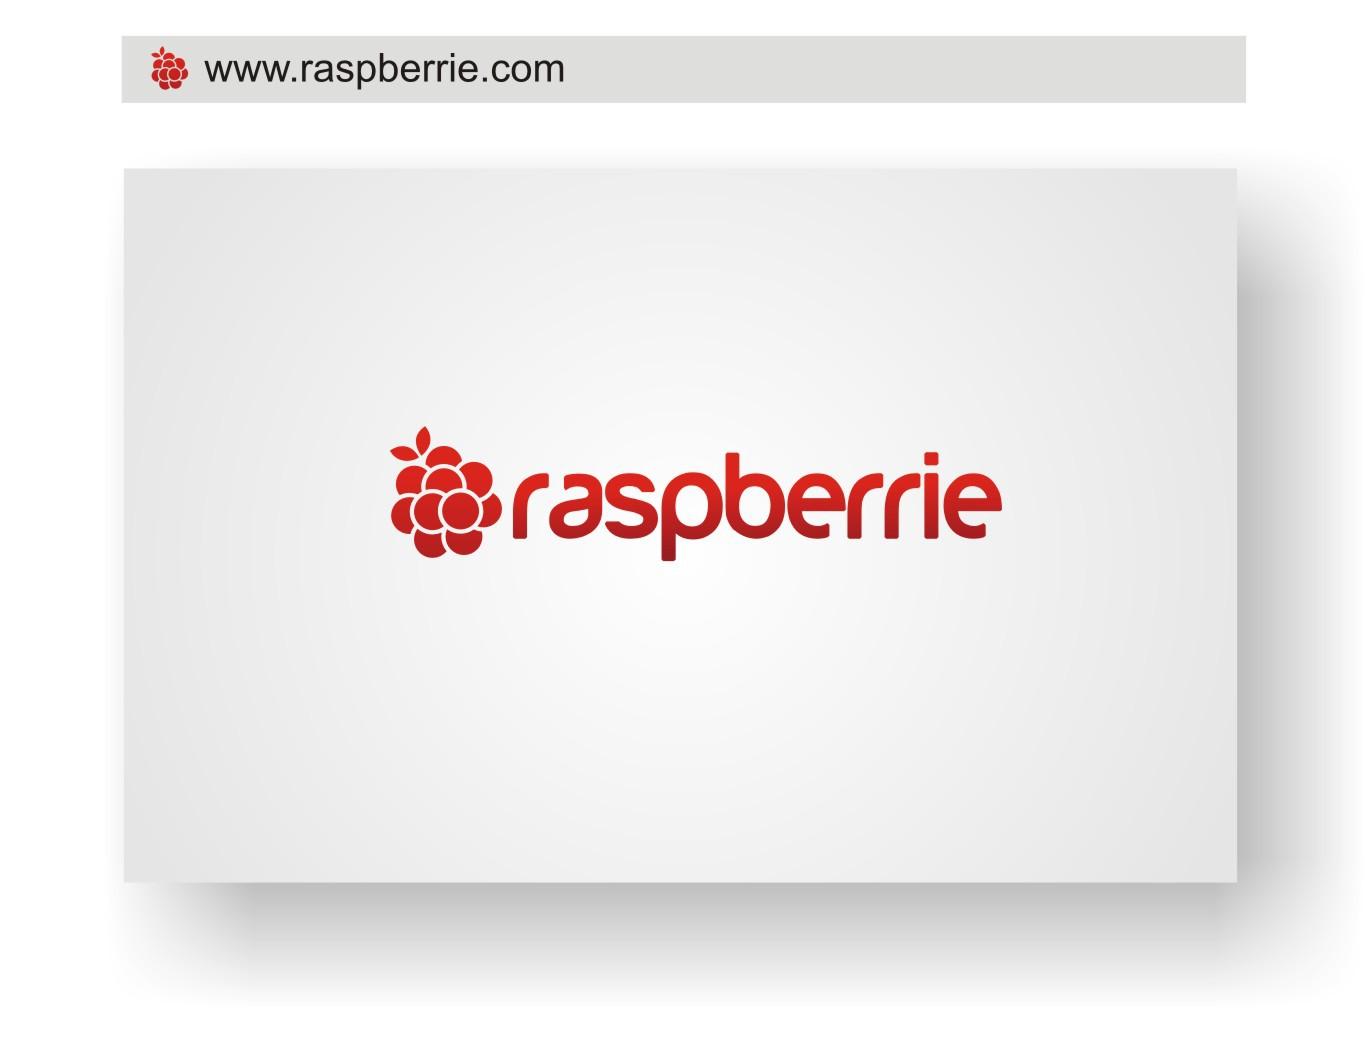 Raspberrie needs a logo!